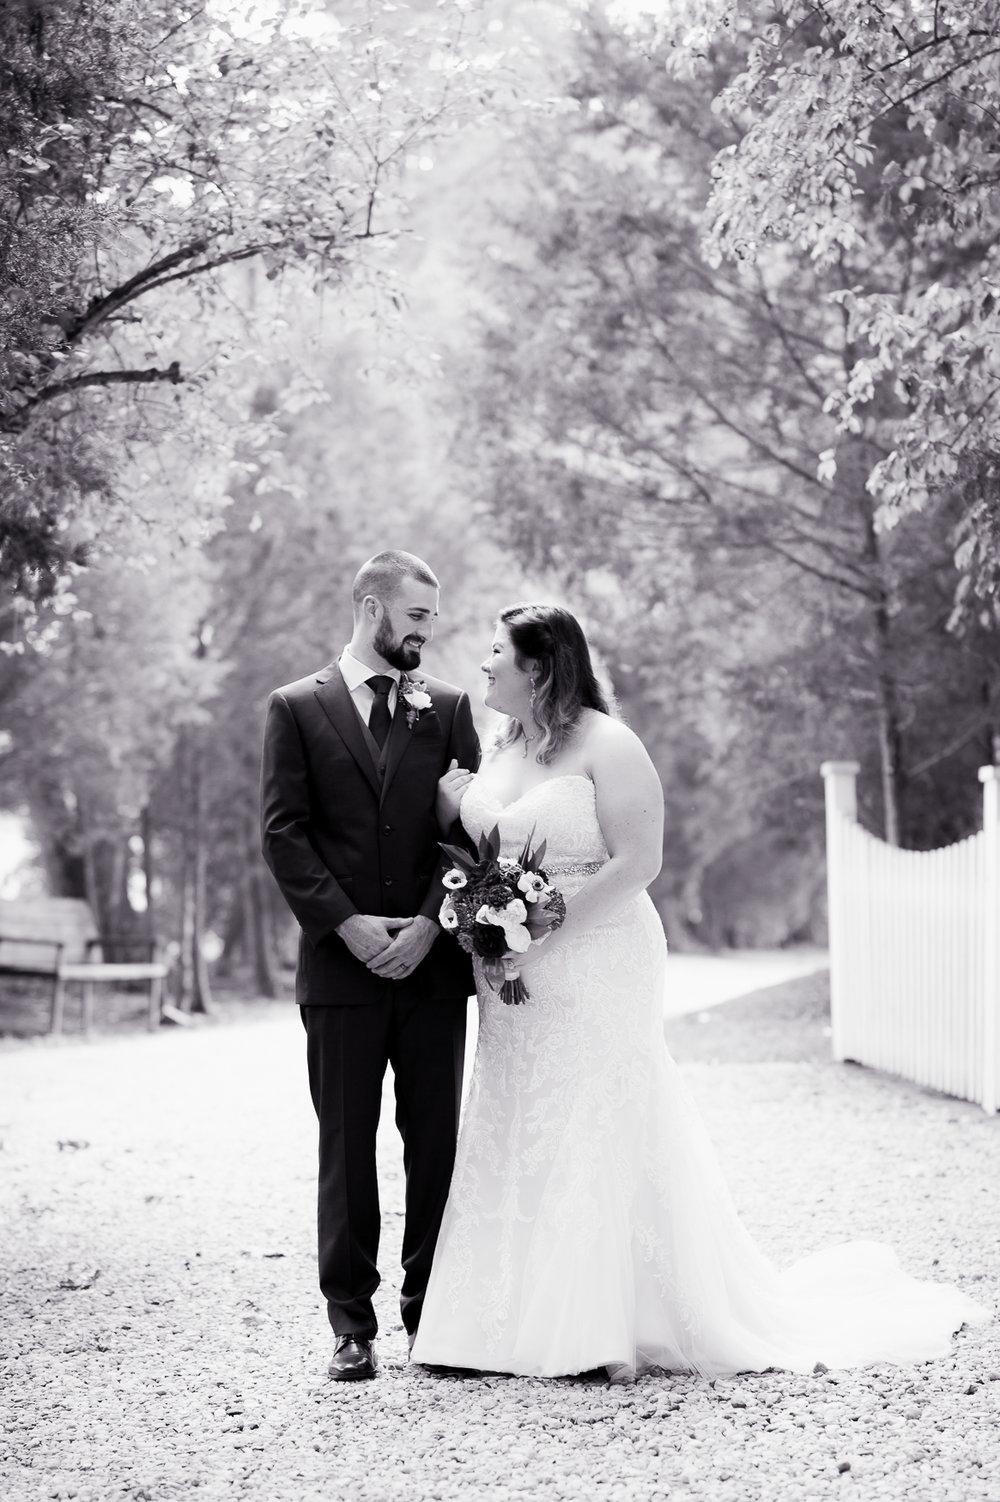 virginiawedding_GlenGarden_rusticwedding_fredericksburg_youseephotography_KellySteven (94).jpg